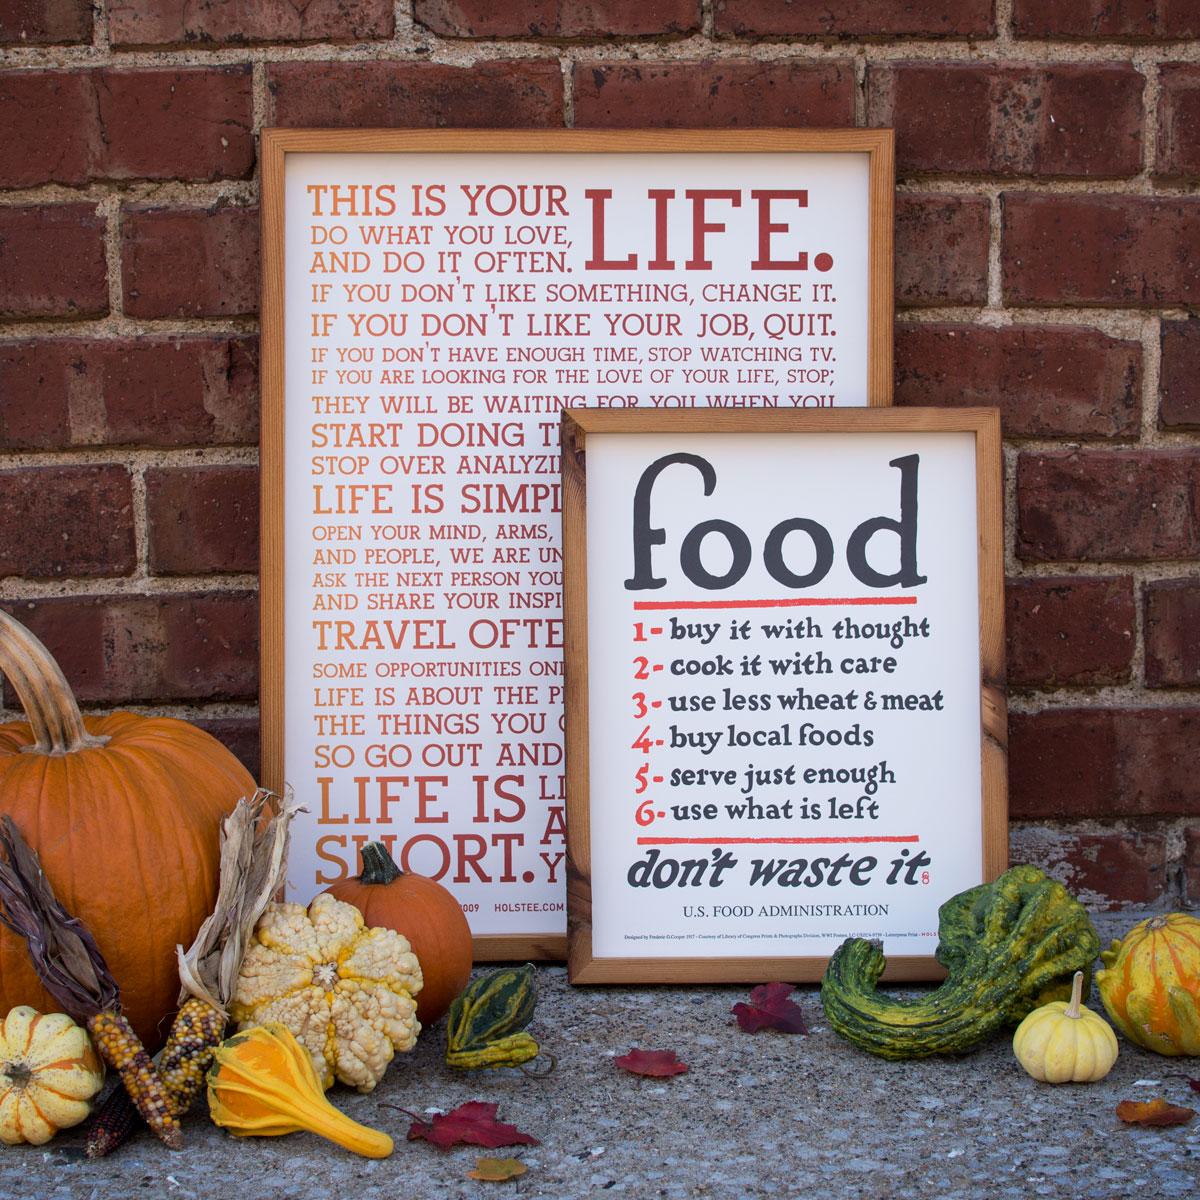 lg-food-rules-sunset-manifesto-right-align-straight-brick-1200px.jpg